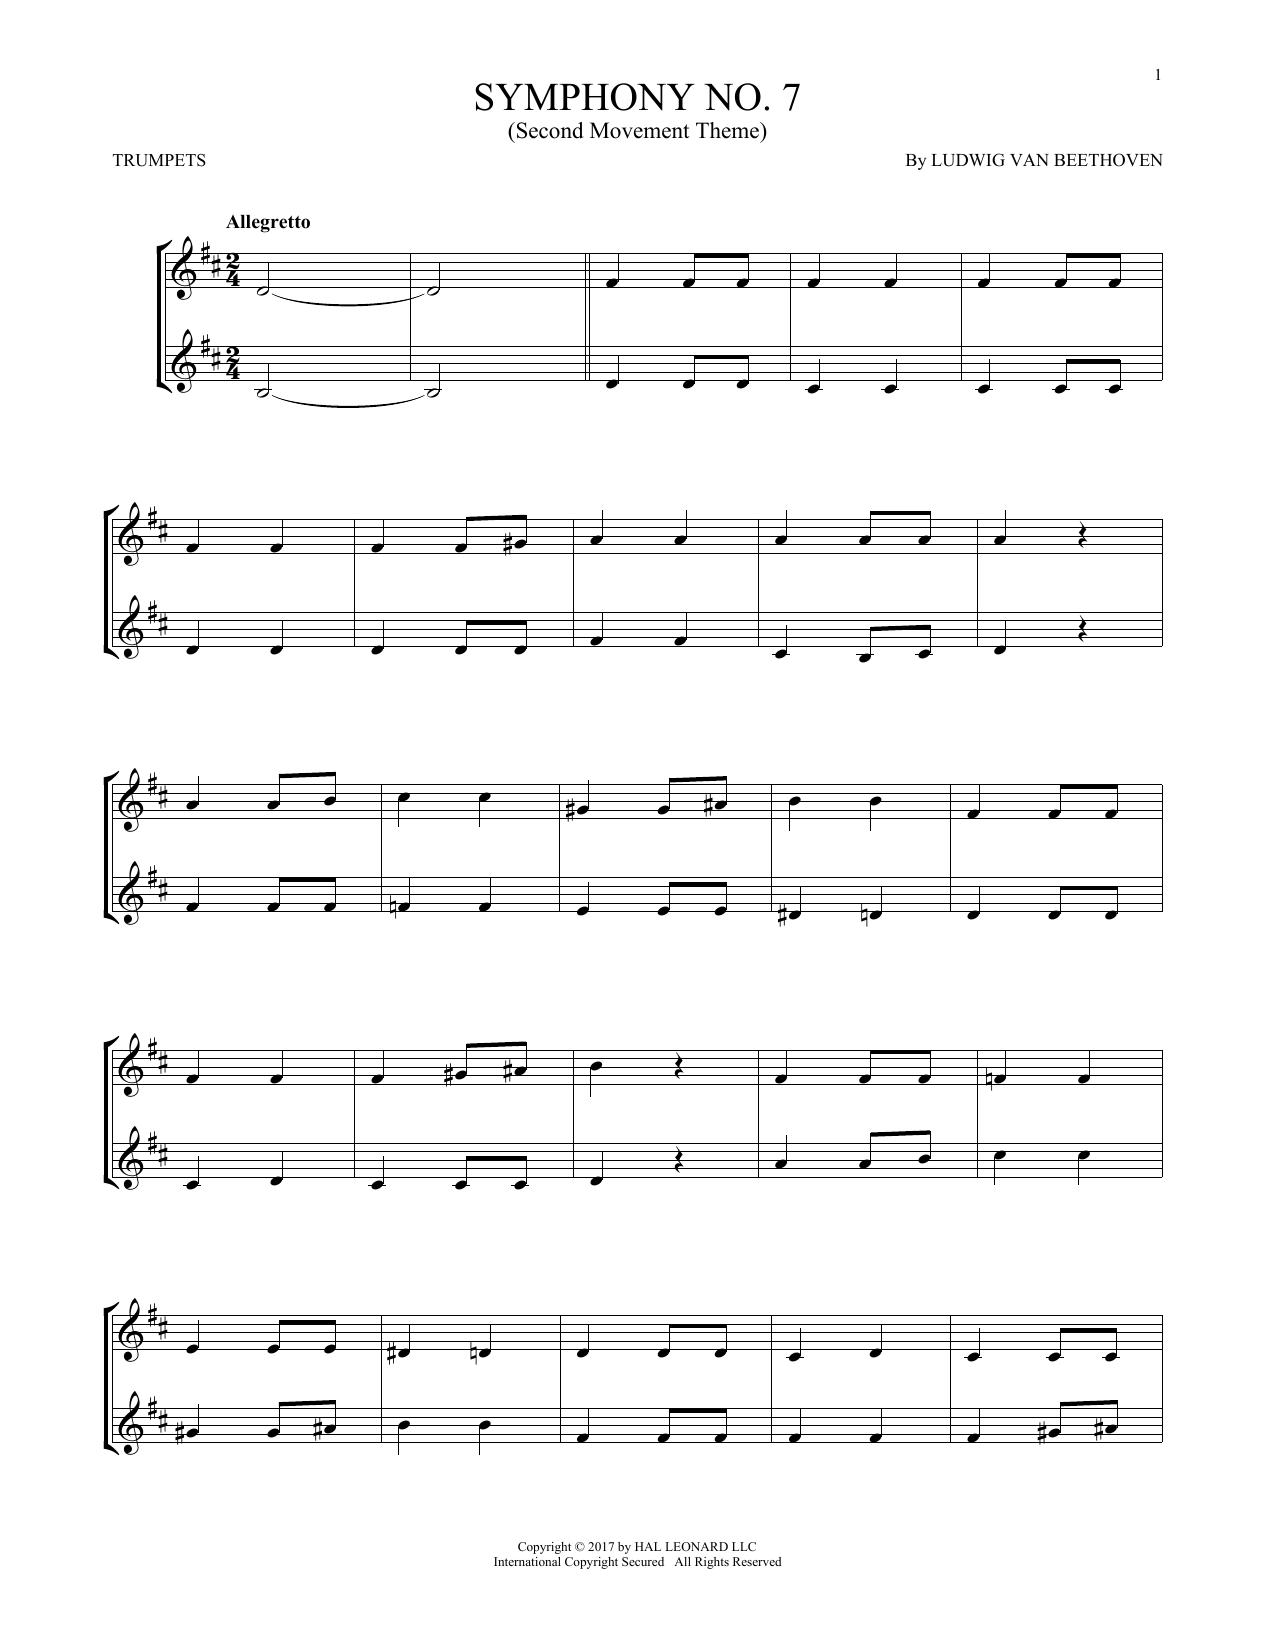 Symphony No. 7 In A Major, Second Movement (Allegretto) (Trumpet Duet)